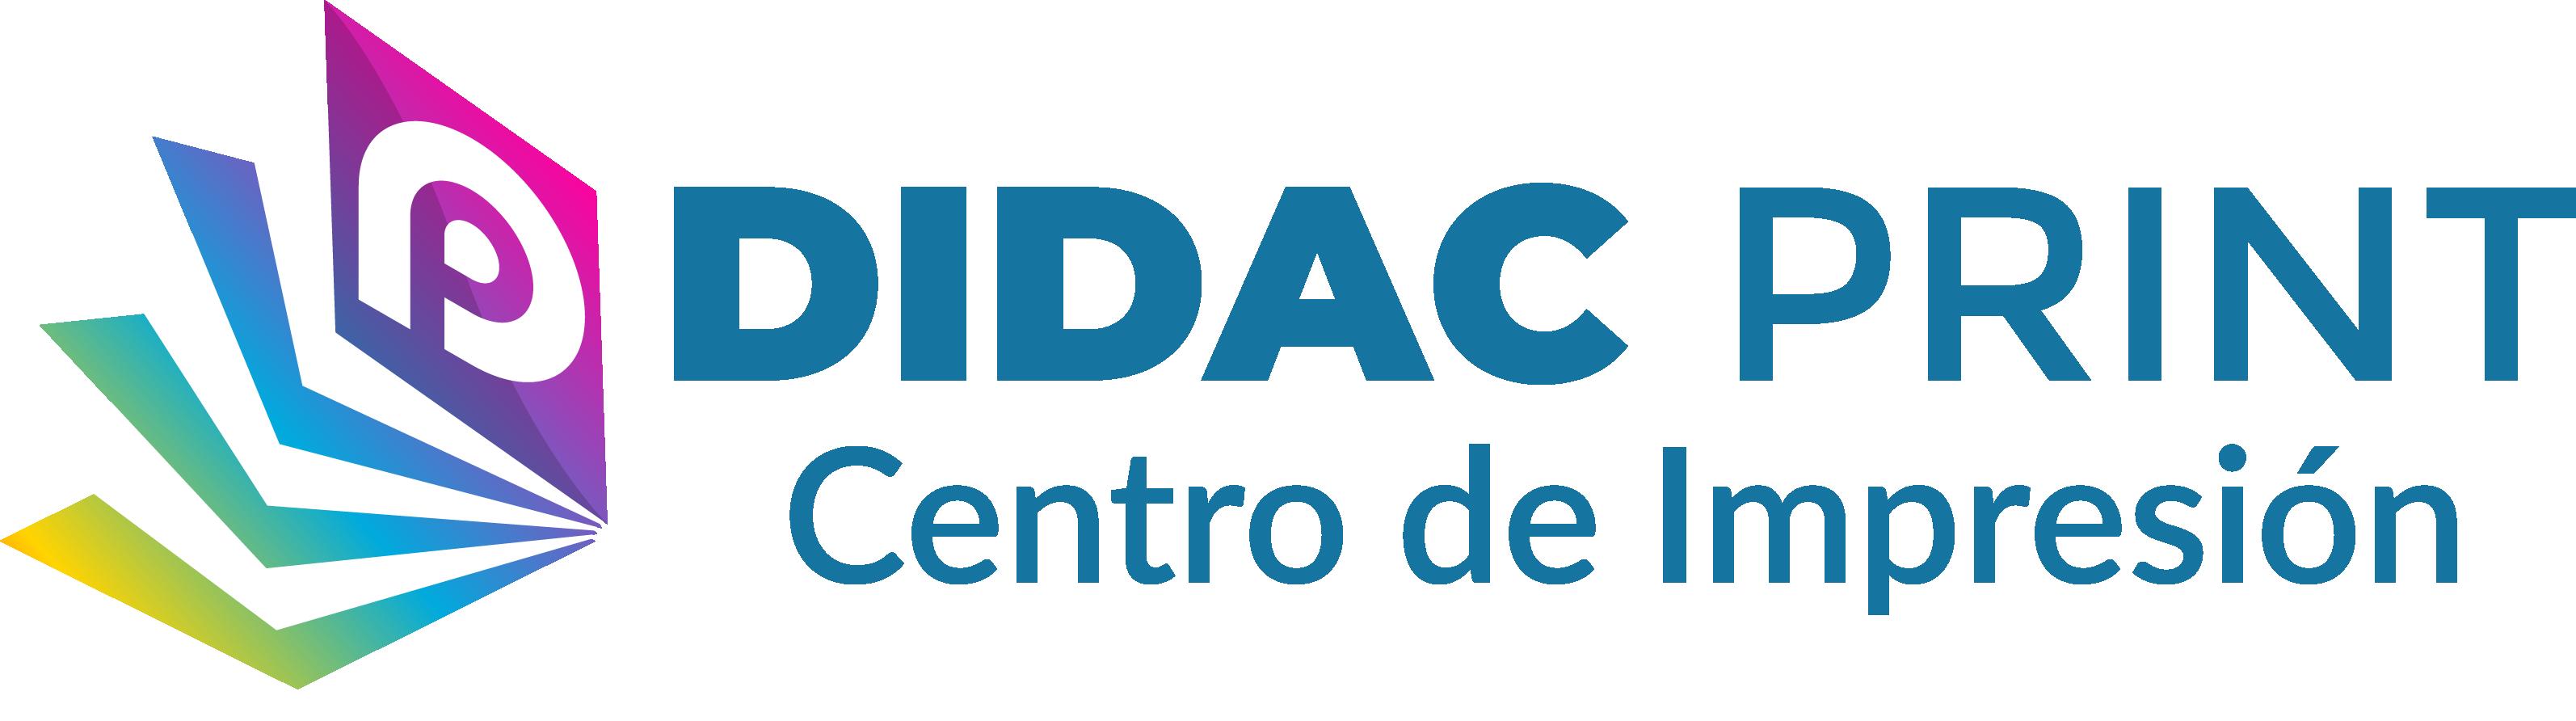 Didac Print